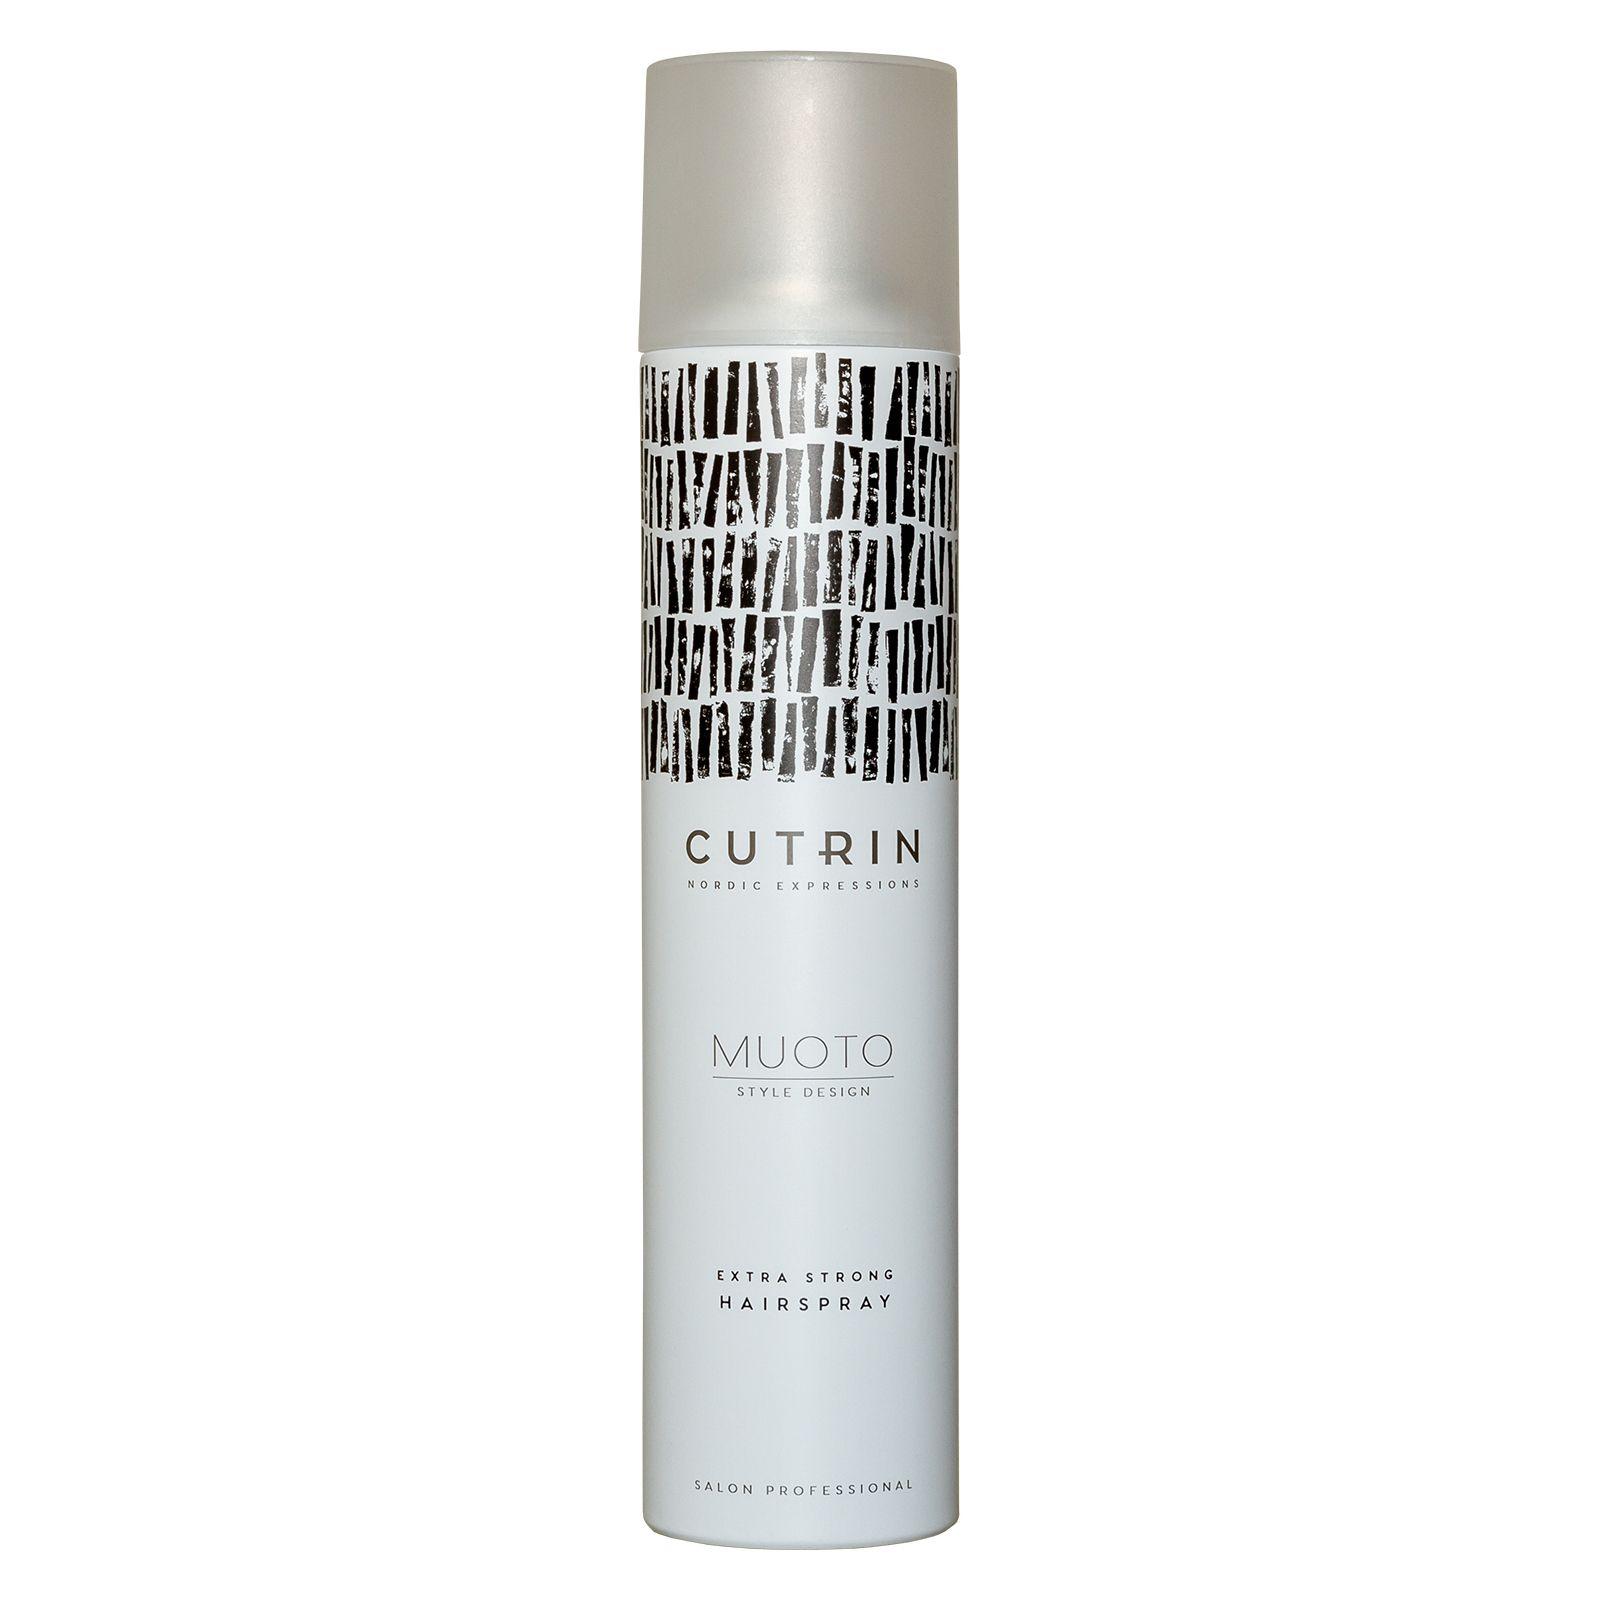 Cutrin Muoto Extra Strong Hairspray - Лак экстрасильной фиксации 300 мл